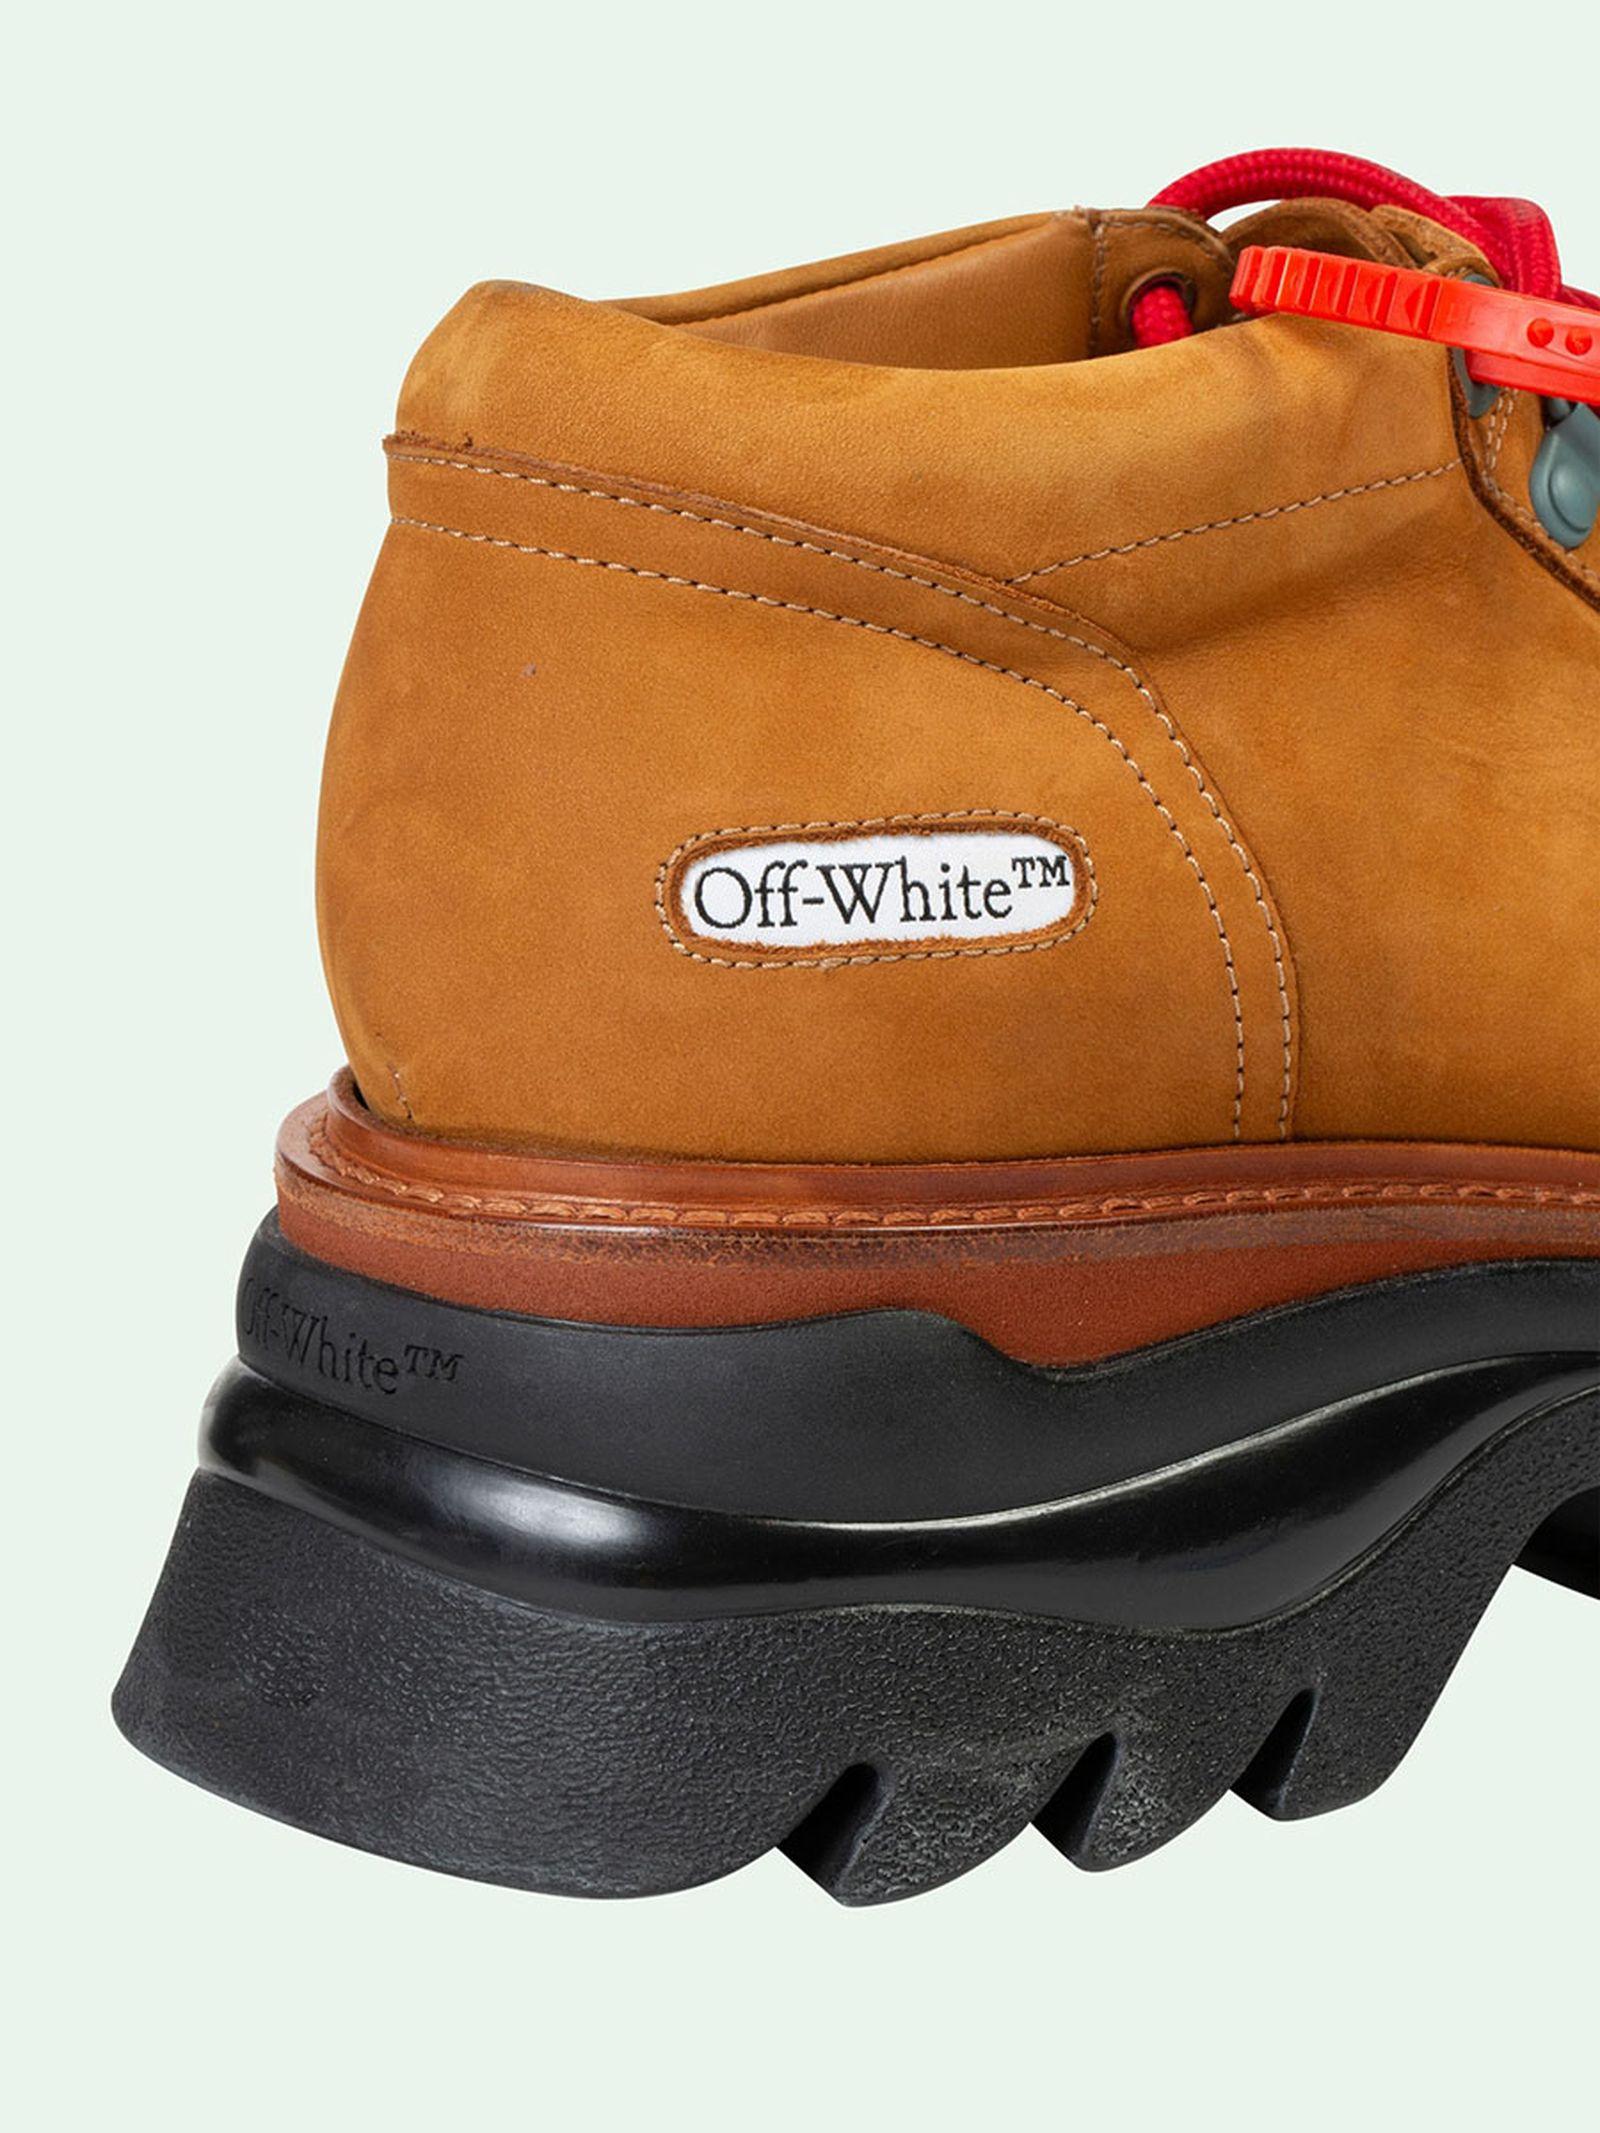 off-white-ridged-sole-sneaker-release-date-price-08